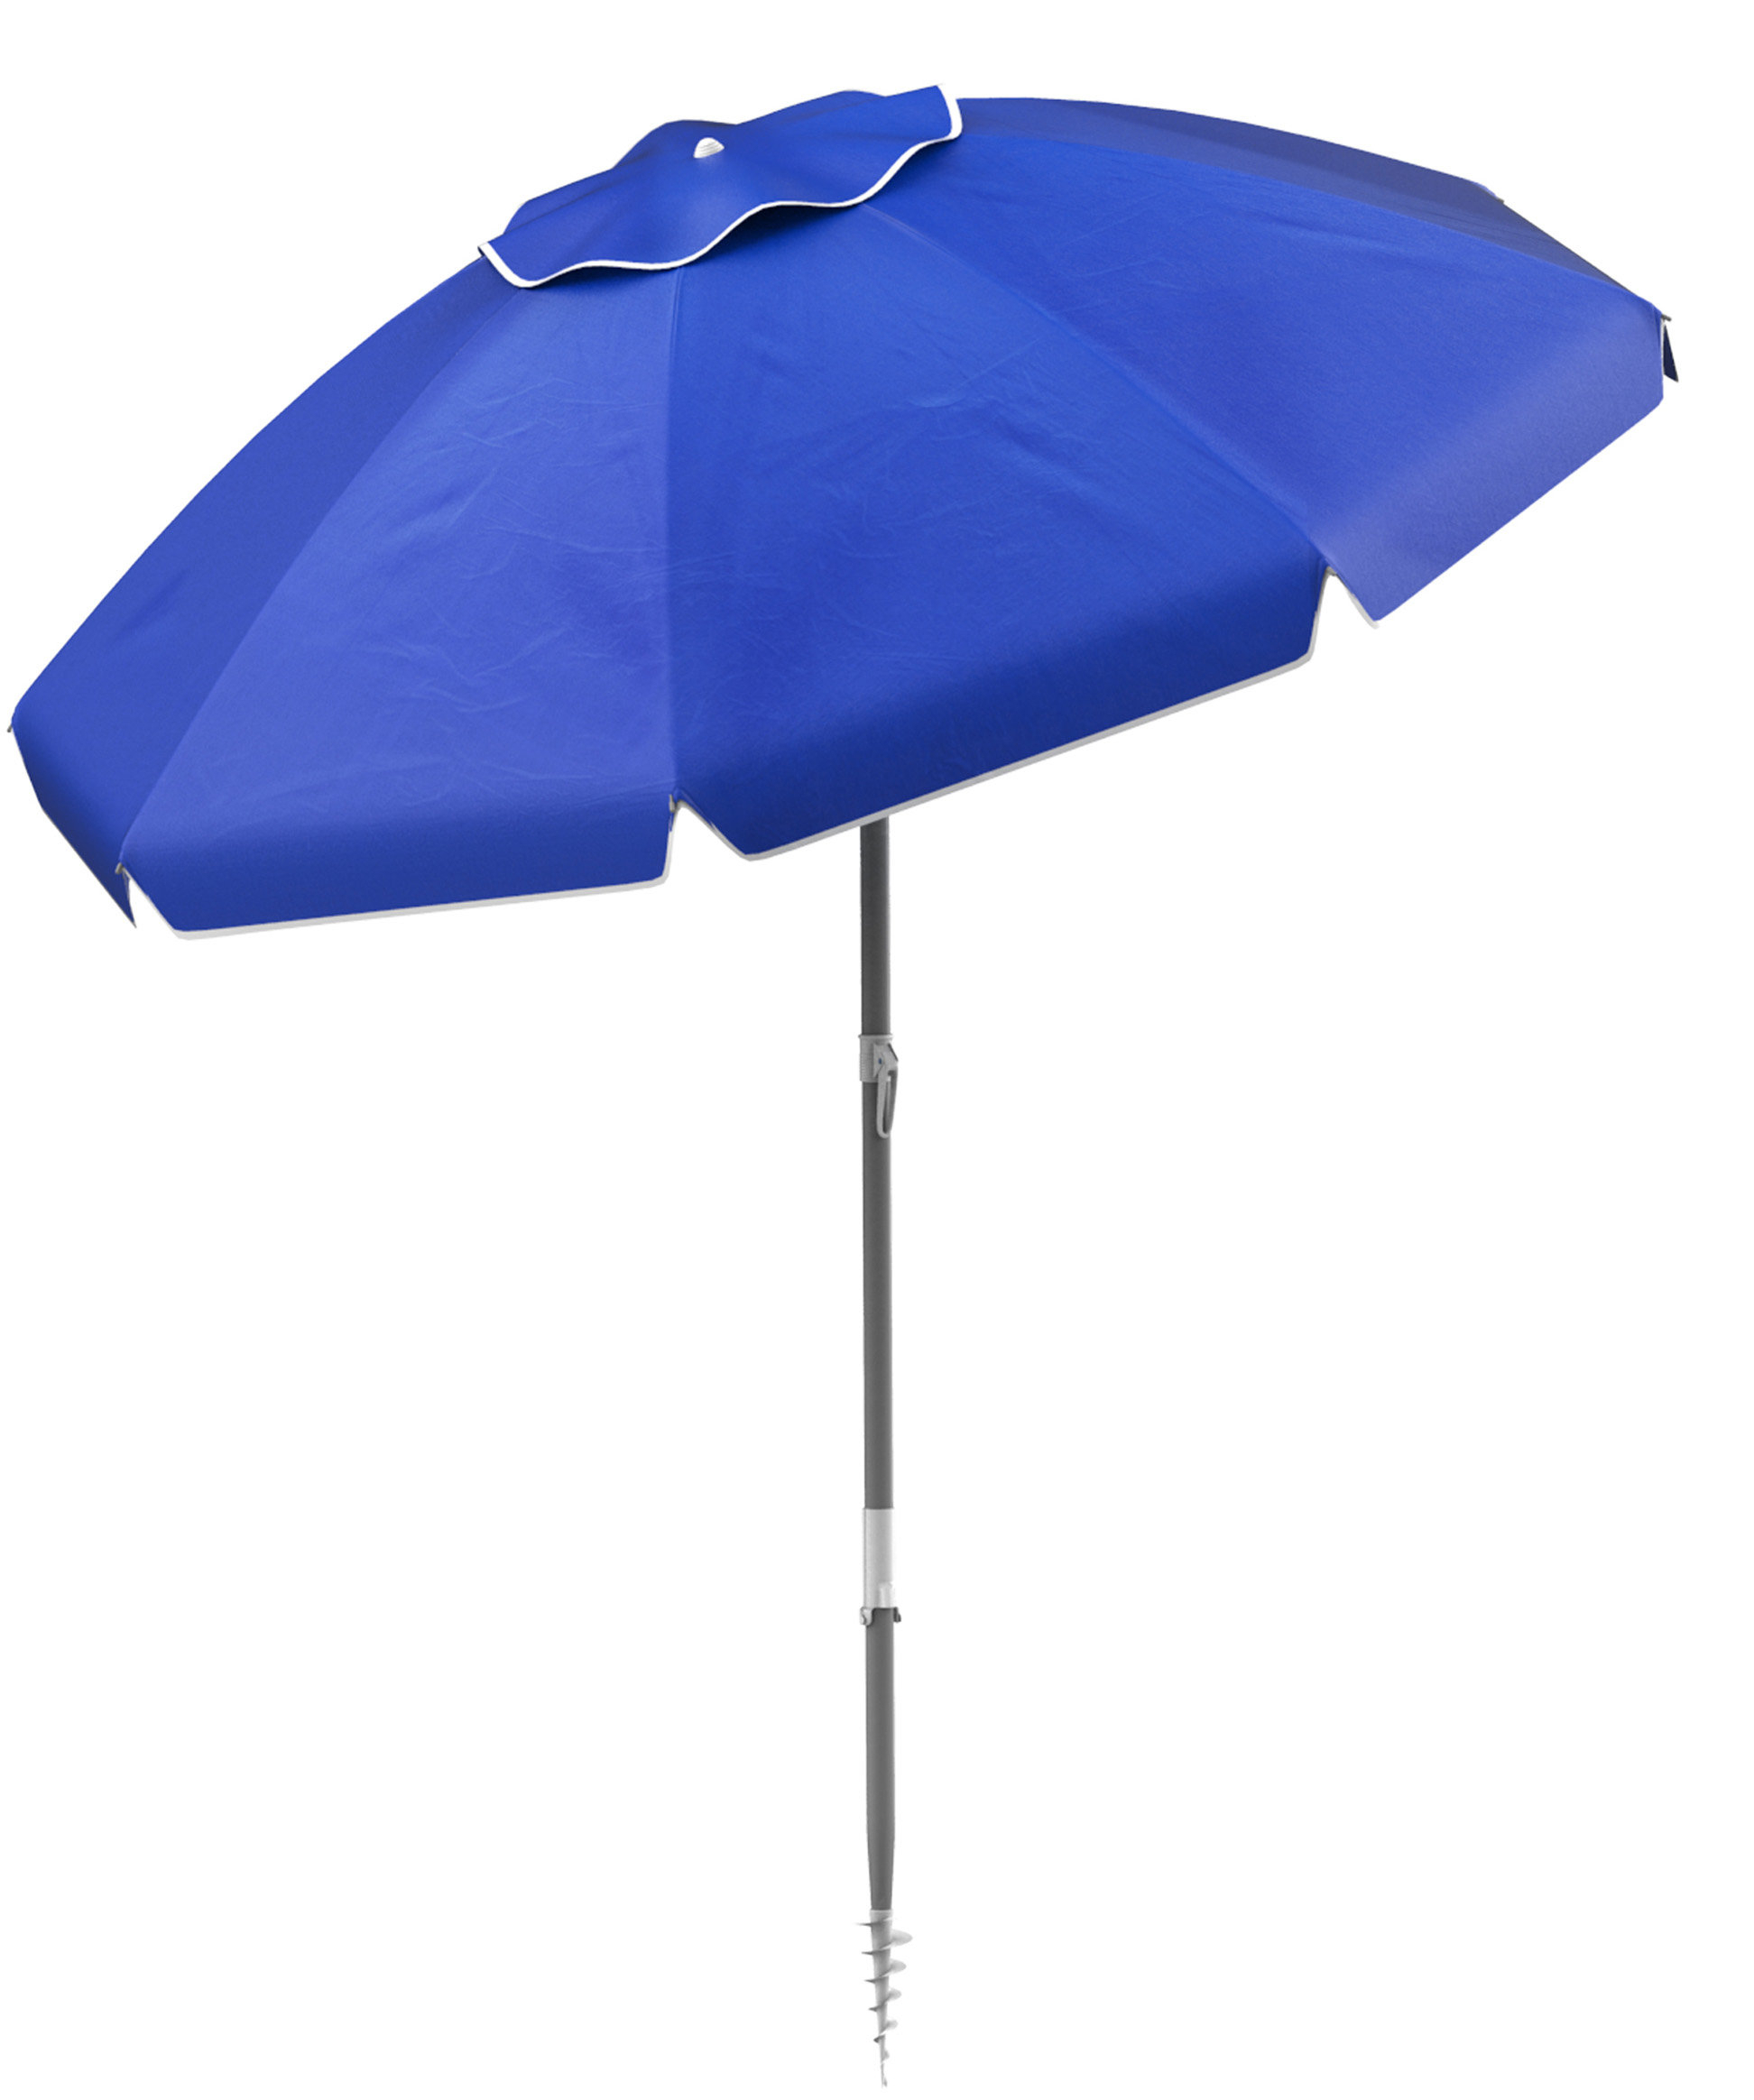 Best And Newest Alyson Joeshade Beach Umbrellas Within Stanhope Tilting Beach Umbrella (View 13 of 20)